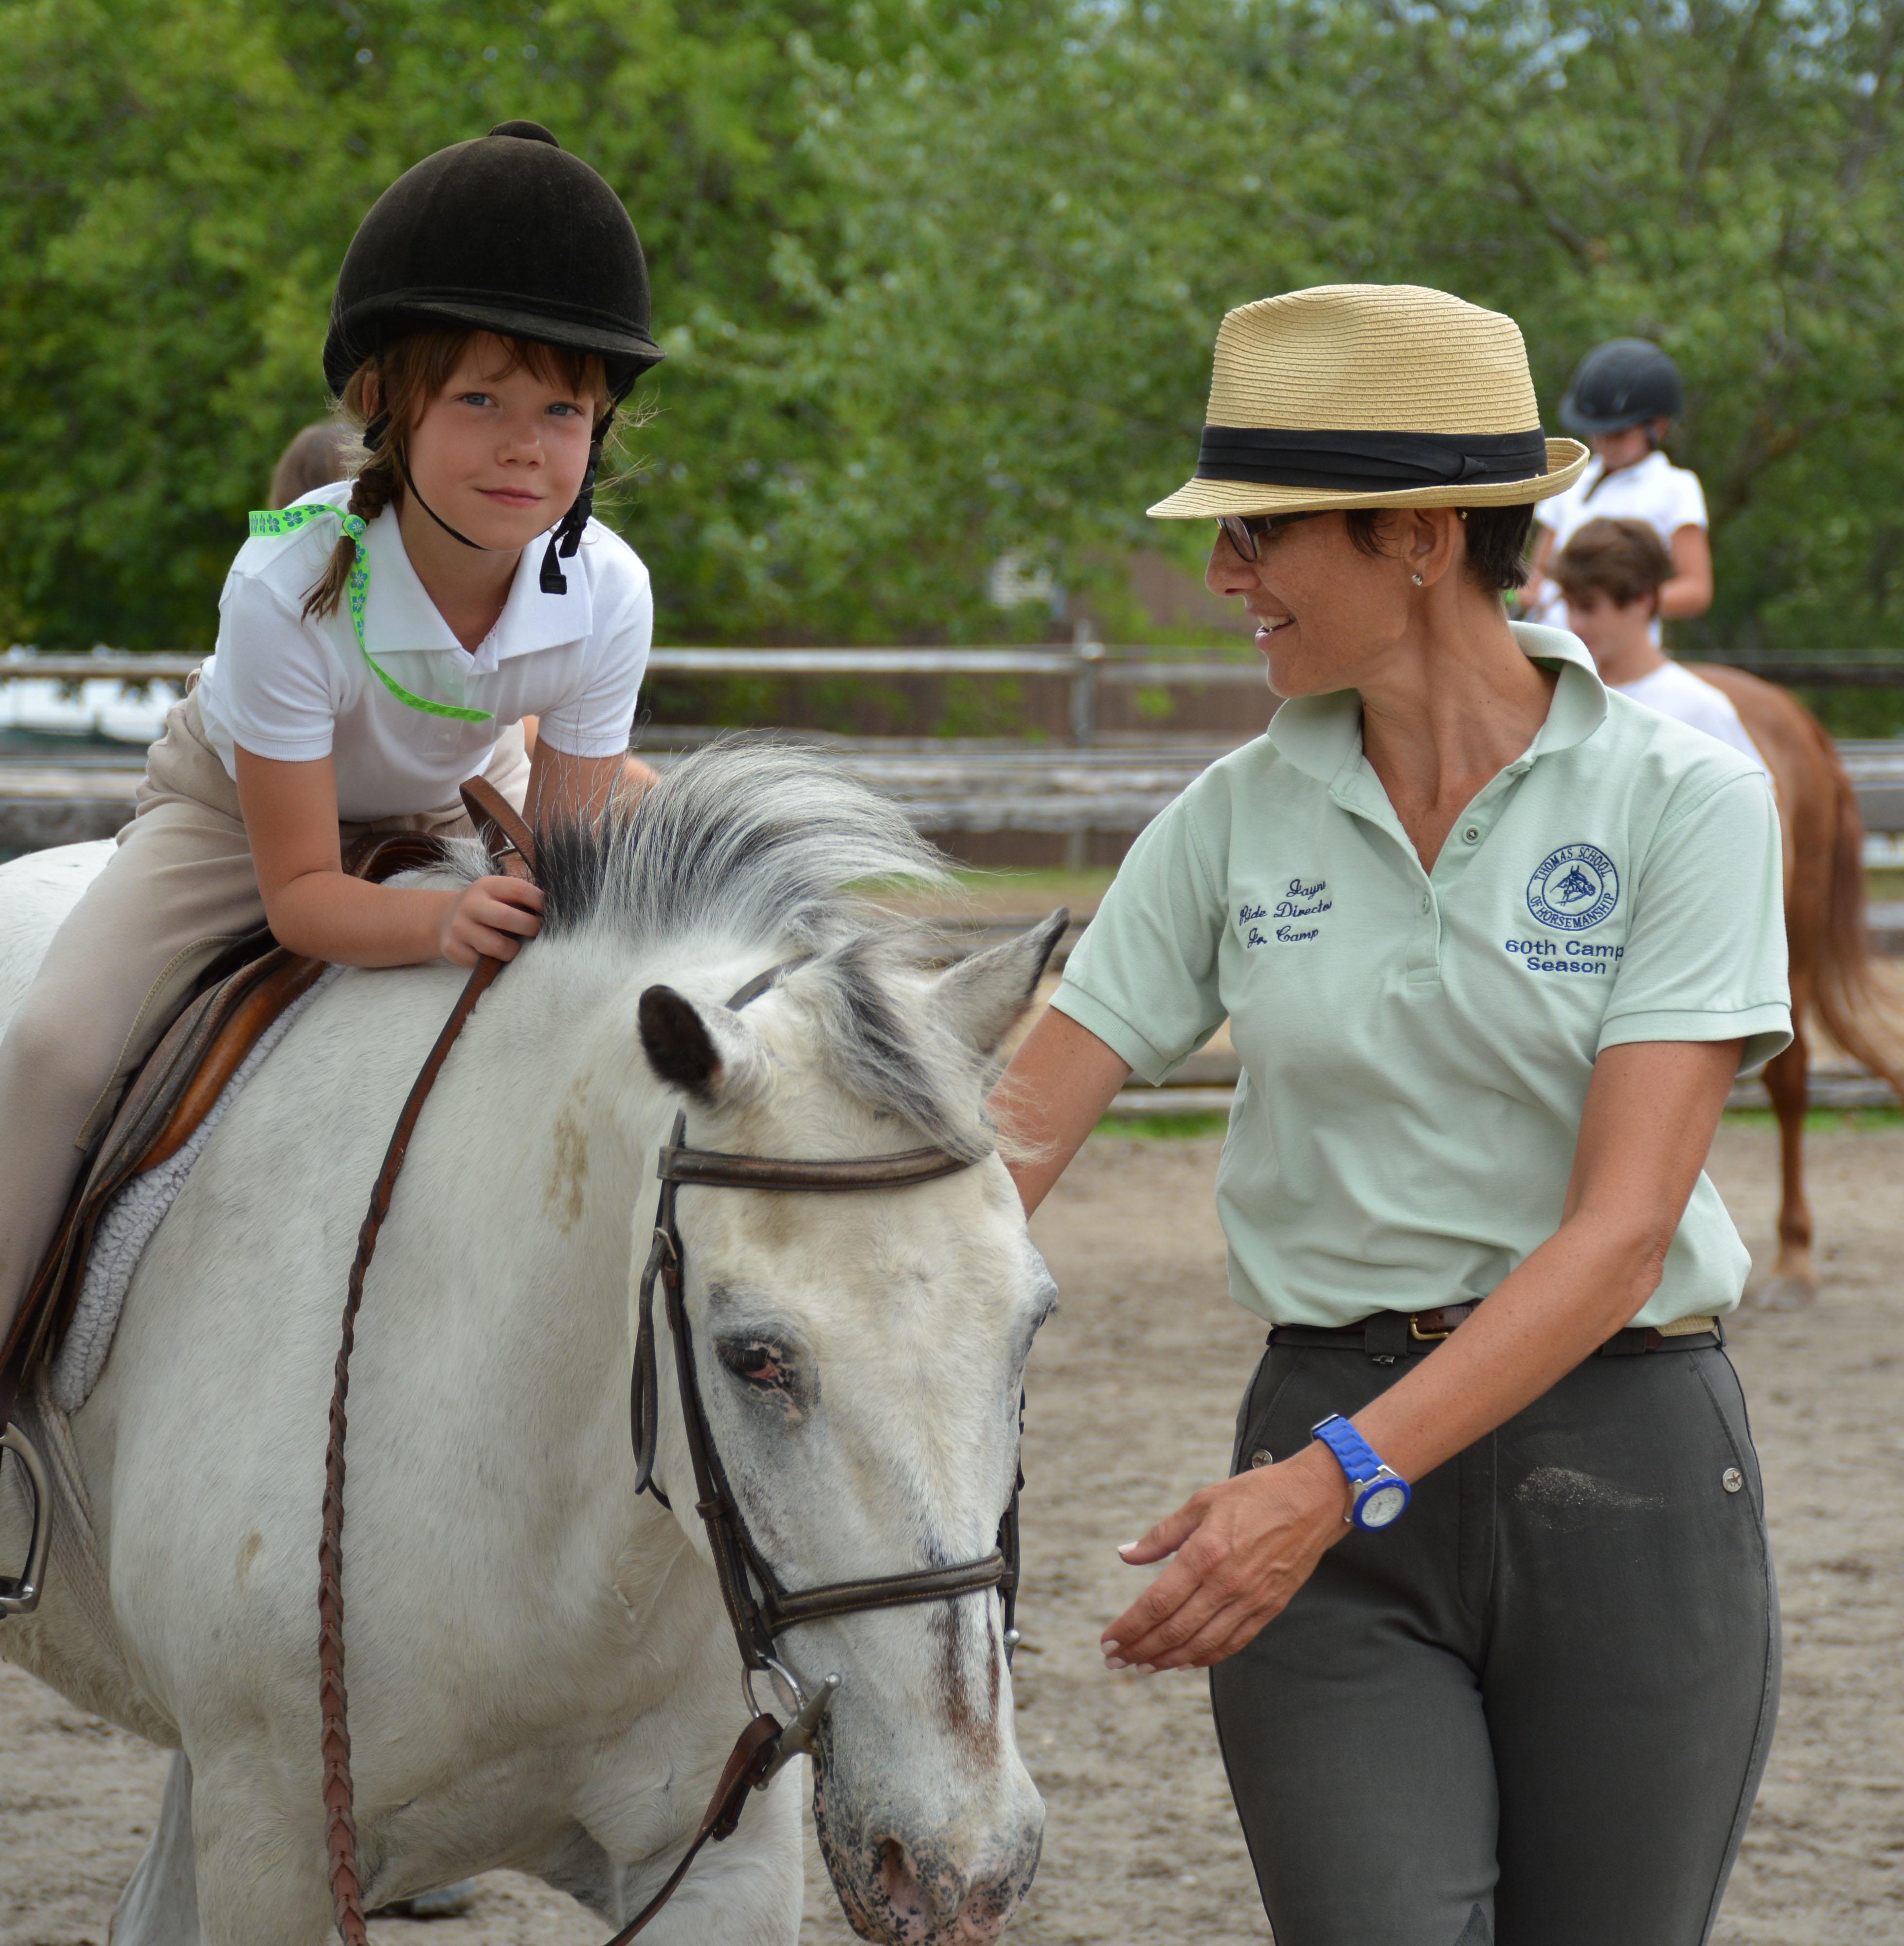 Thomas School of Horsemanship Summer Day Camp & Riding School image 10